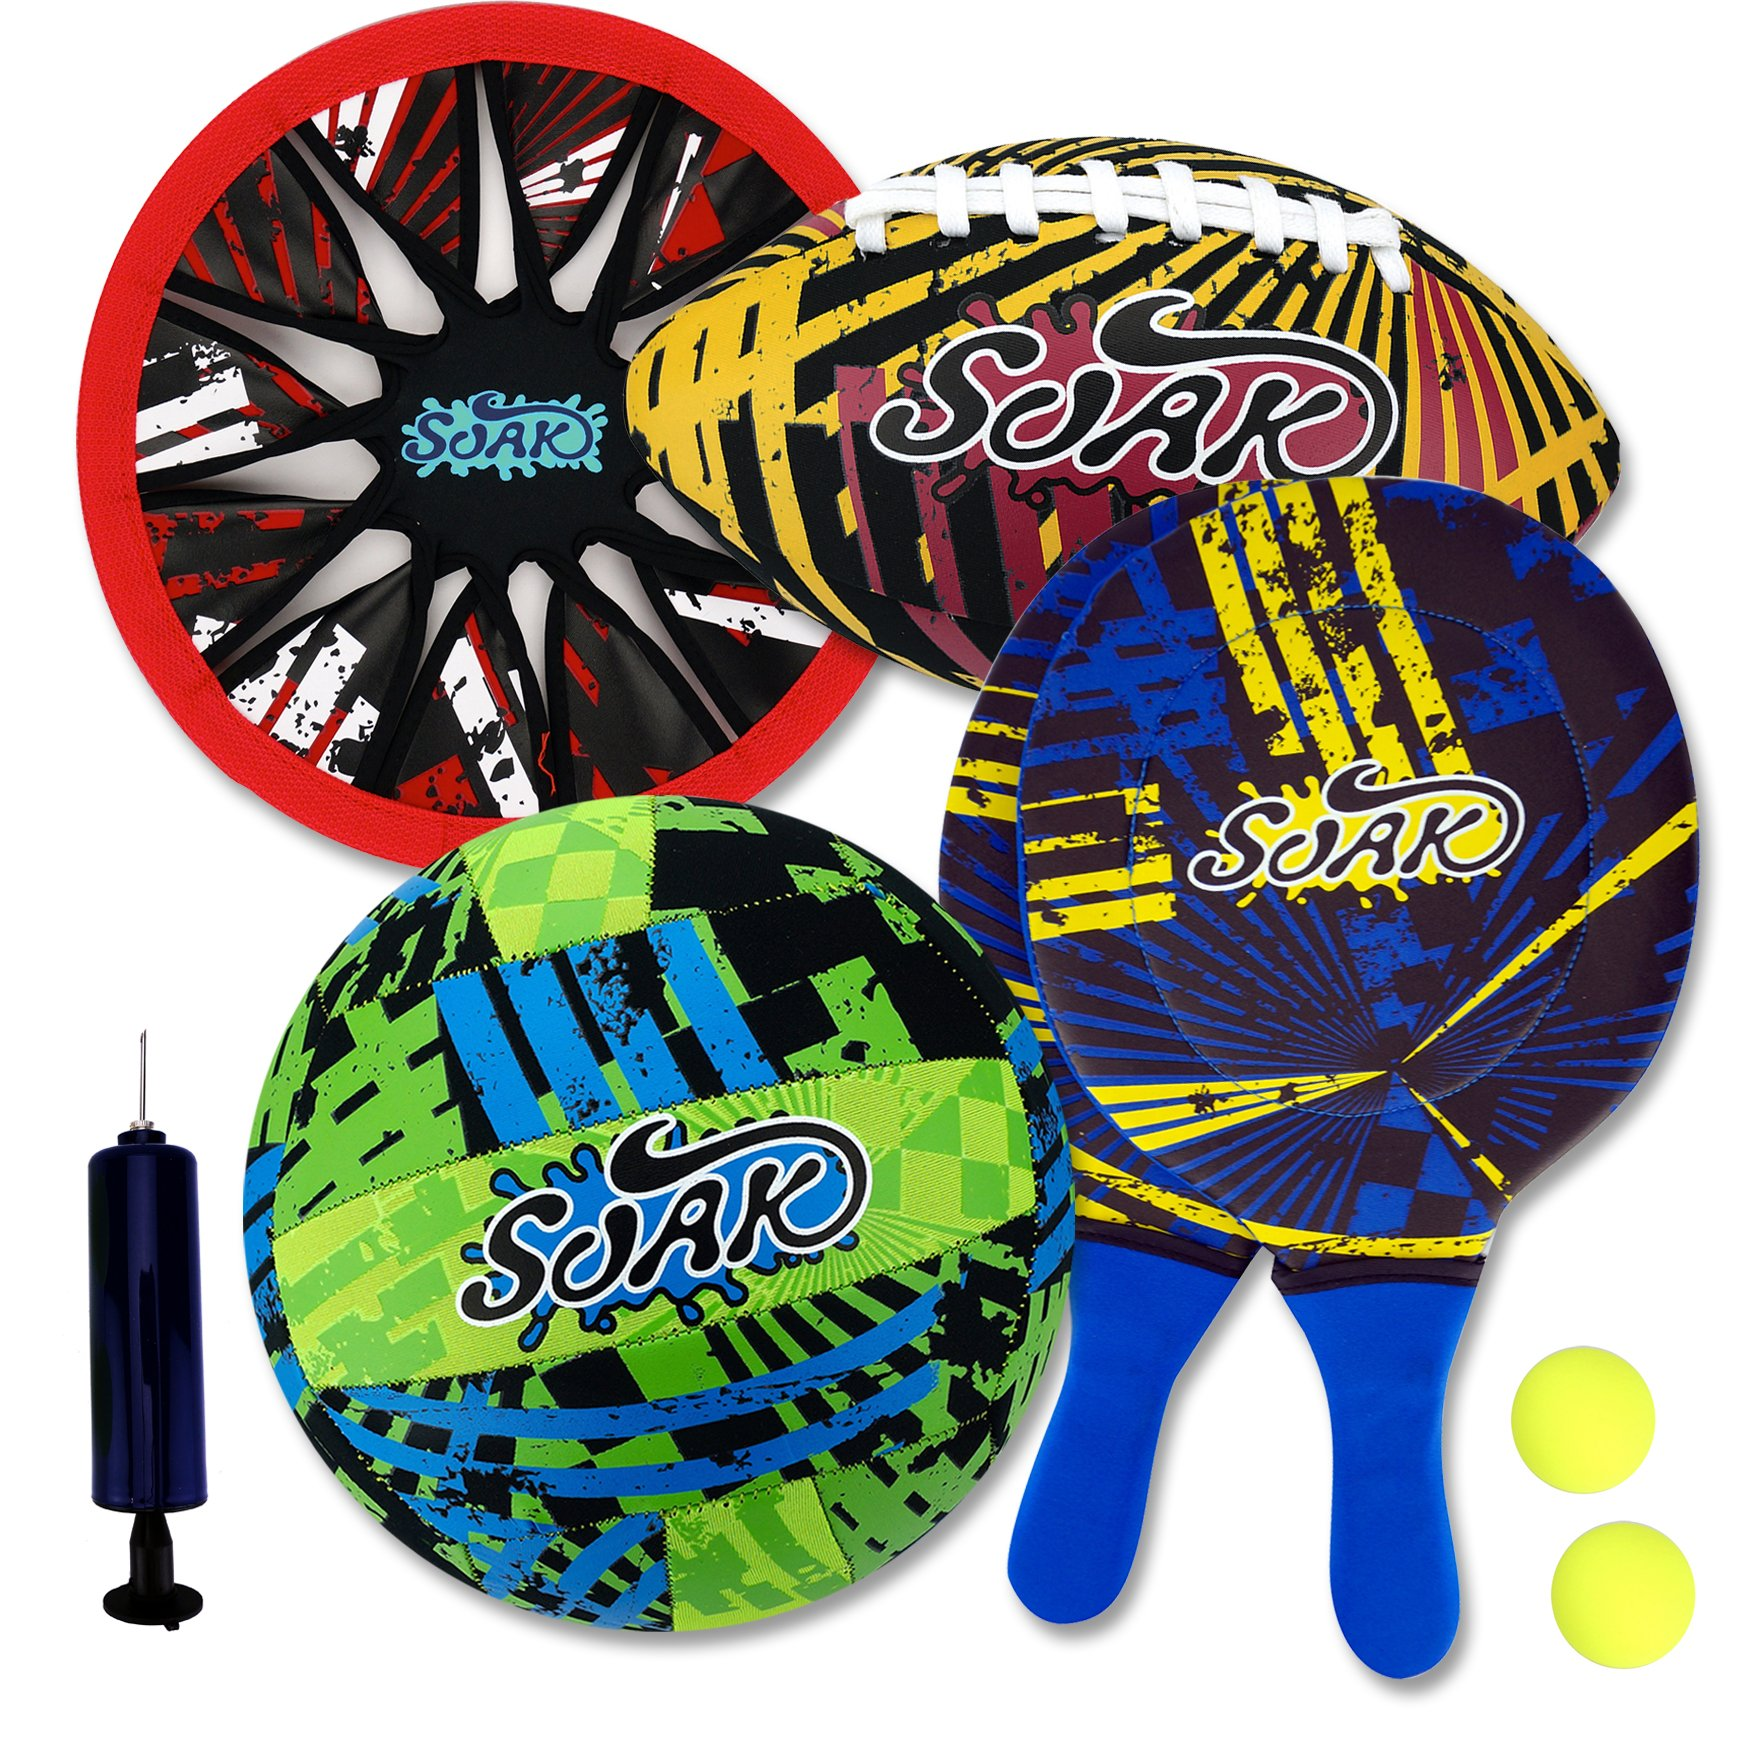 Beach Game Combo Set - Radiate Series - Beach Paddle, Frisbee, Football, Volleyball - 8 Pc Set